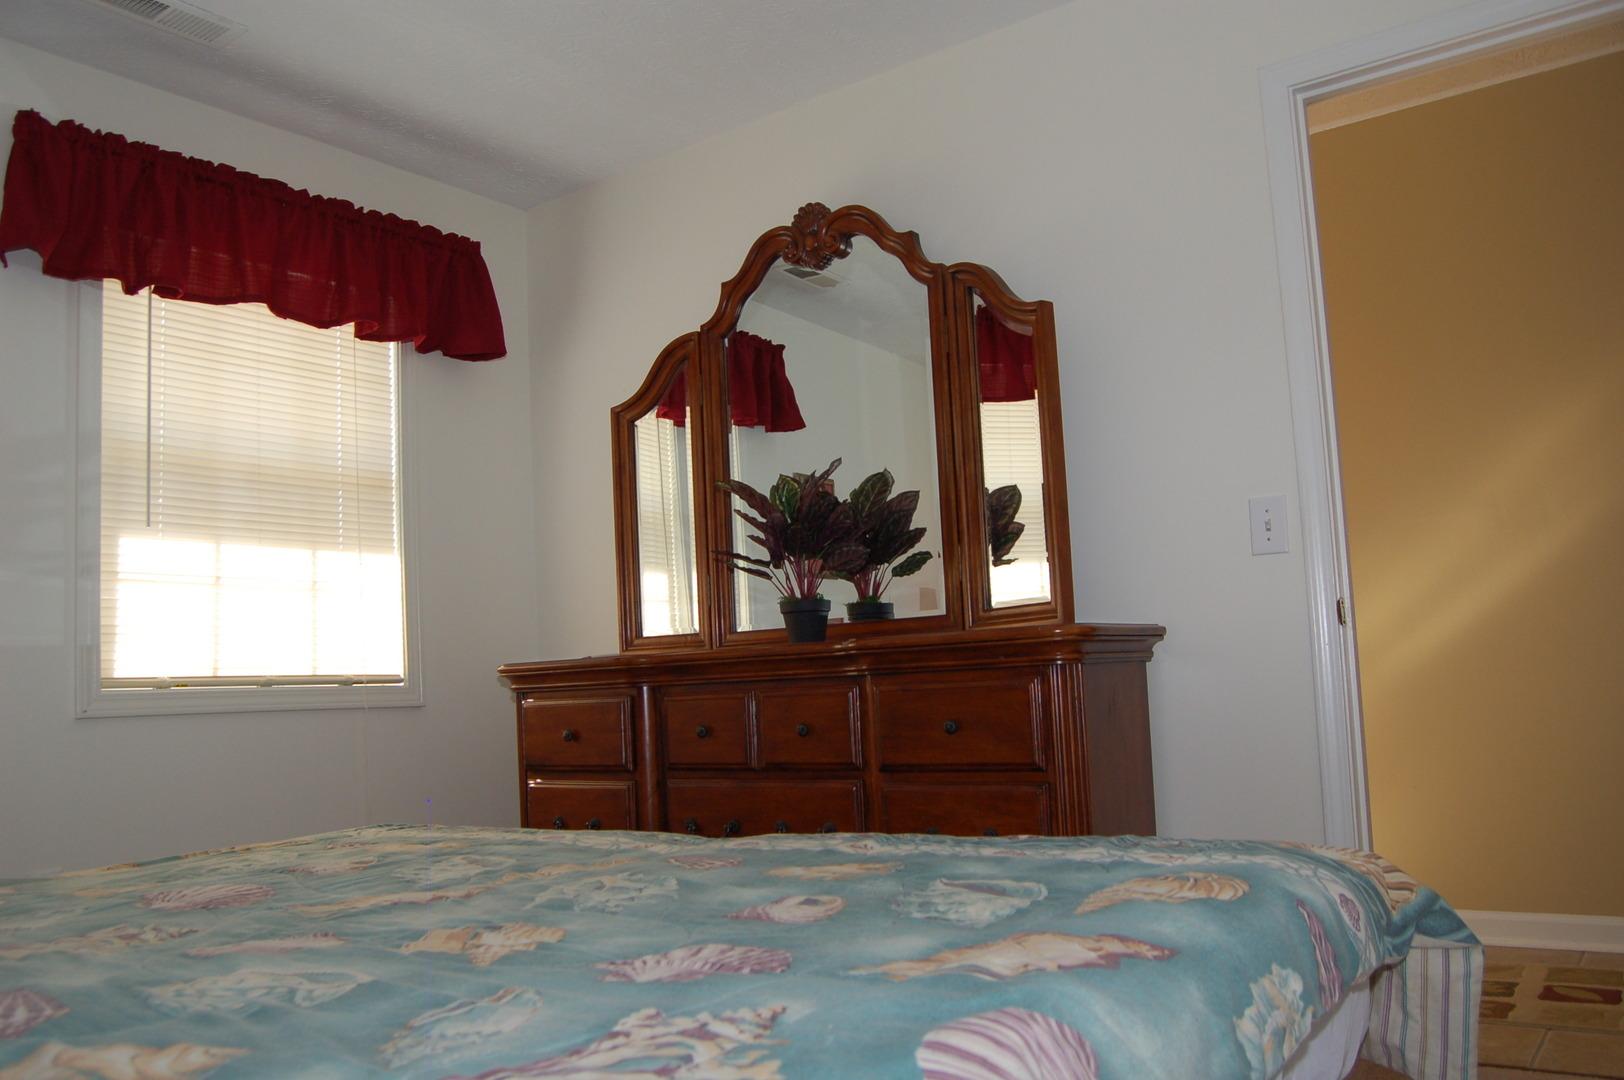 2nd Floor Furnished 1 Bedroom Condo In River Oaks Myrtle Beach Rental